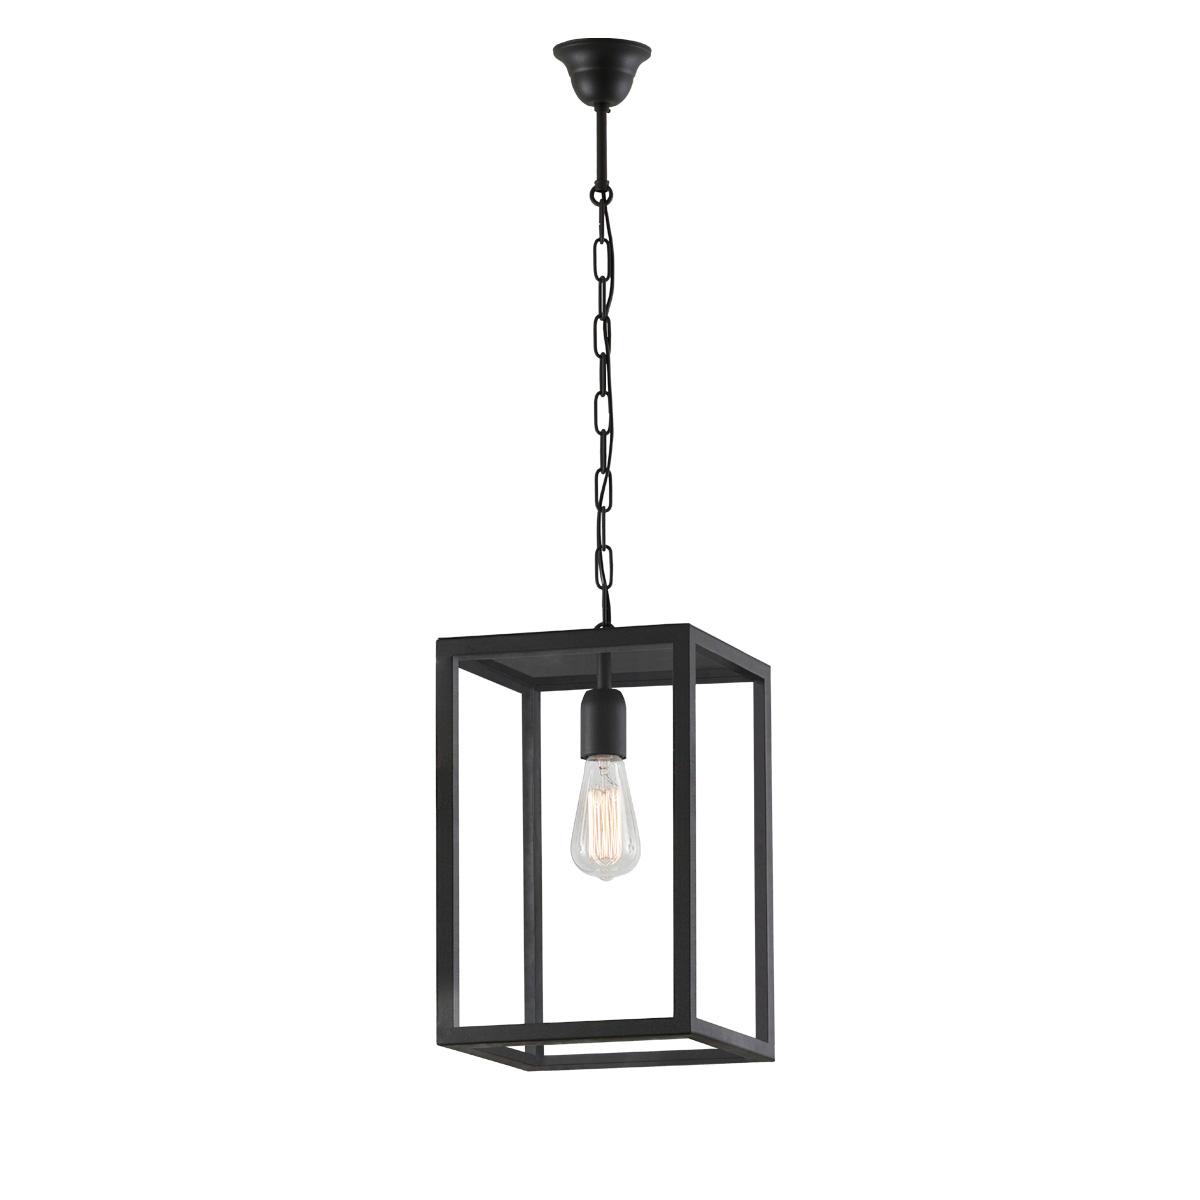 Industrial φωτιστικό ΘΑΣΟΣ industrial pendant lamp